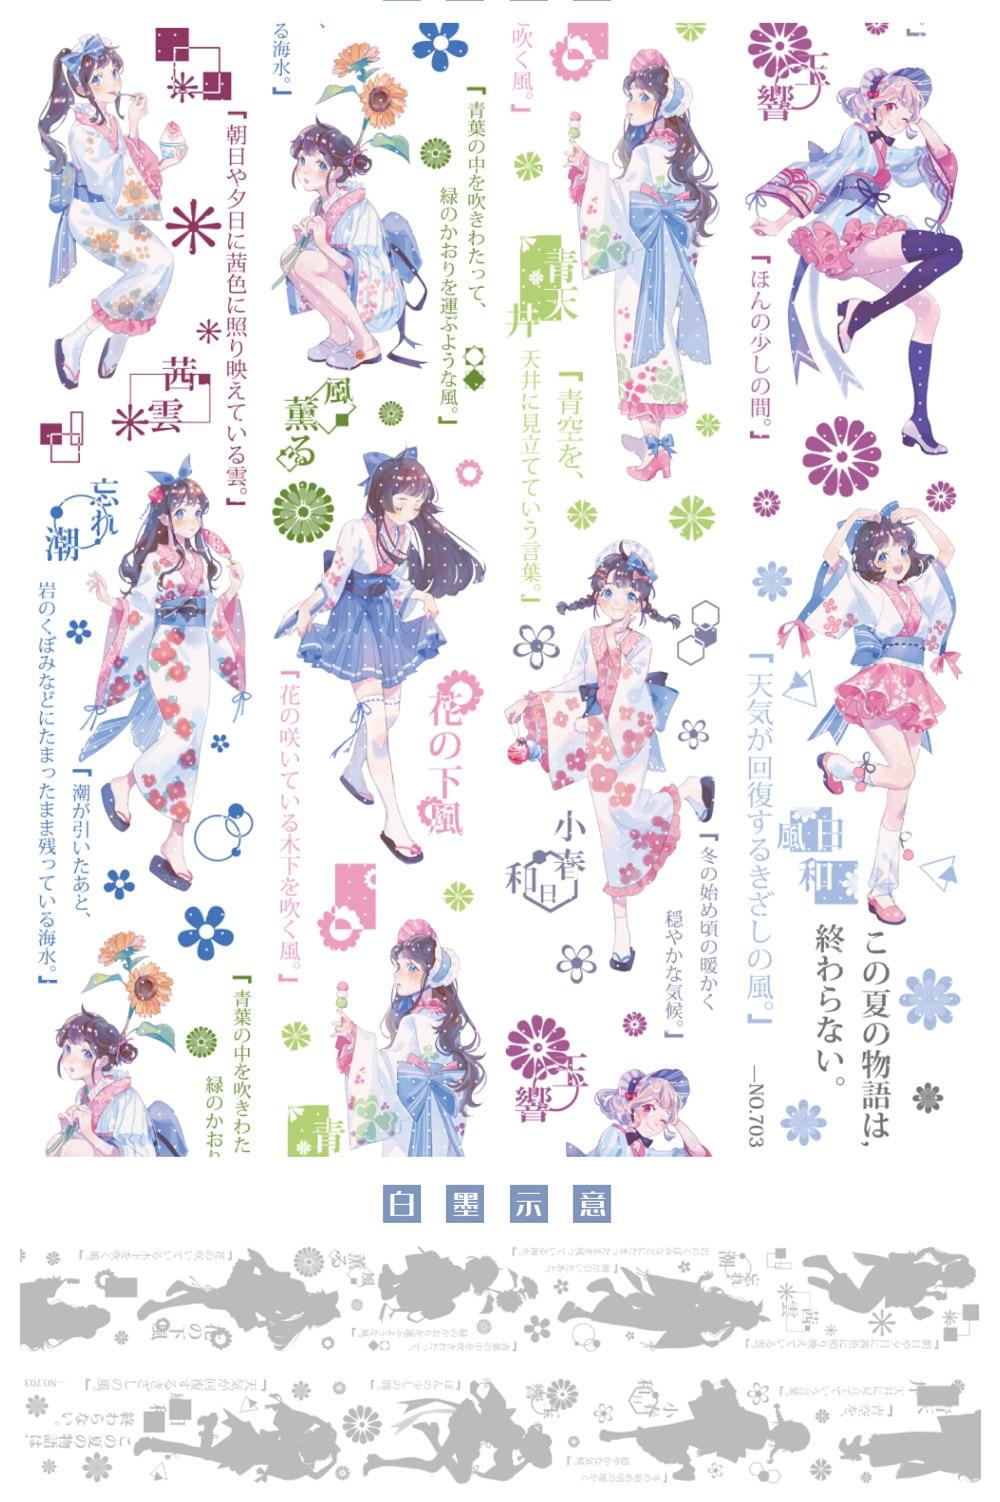 1-tamano-del-lazo-xiawuyu-dulce-hefengnu-cinta-adhesiva-decorativa-90cm